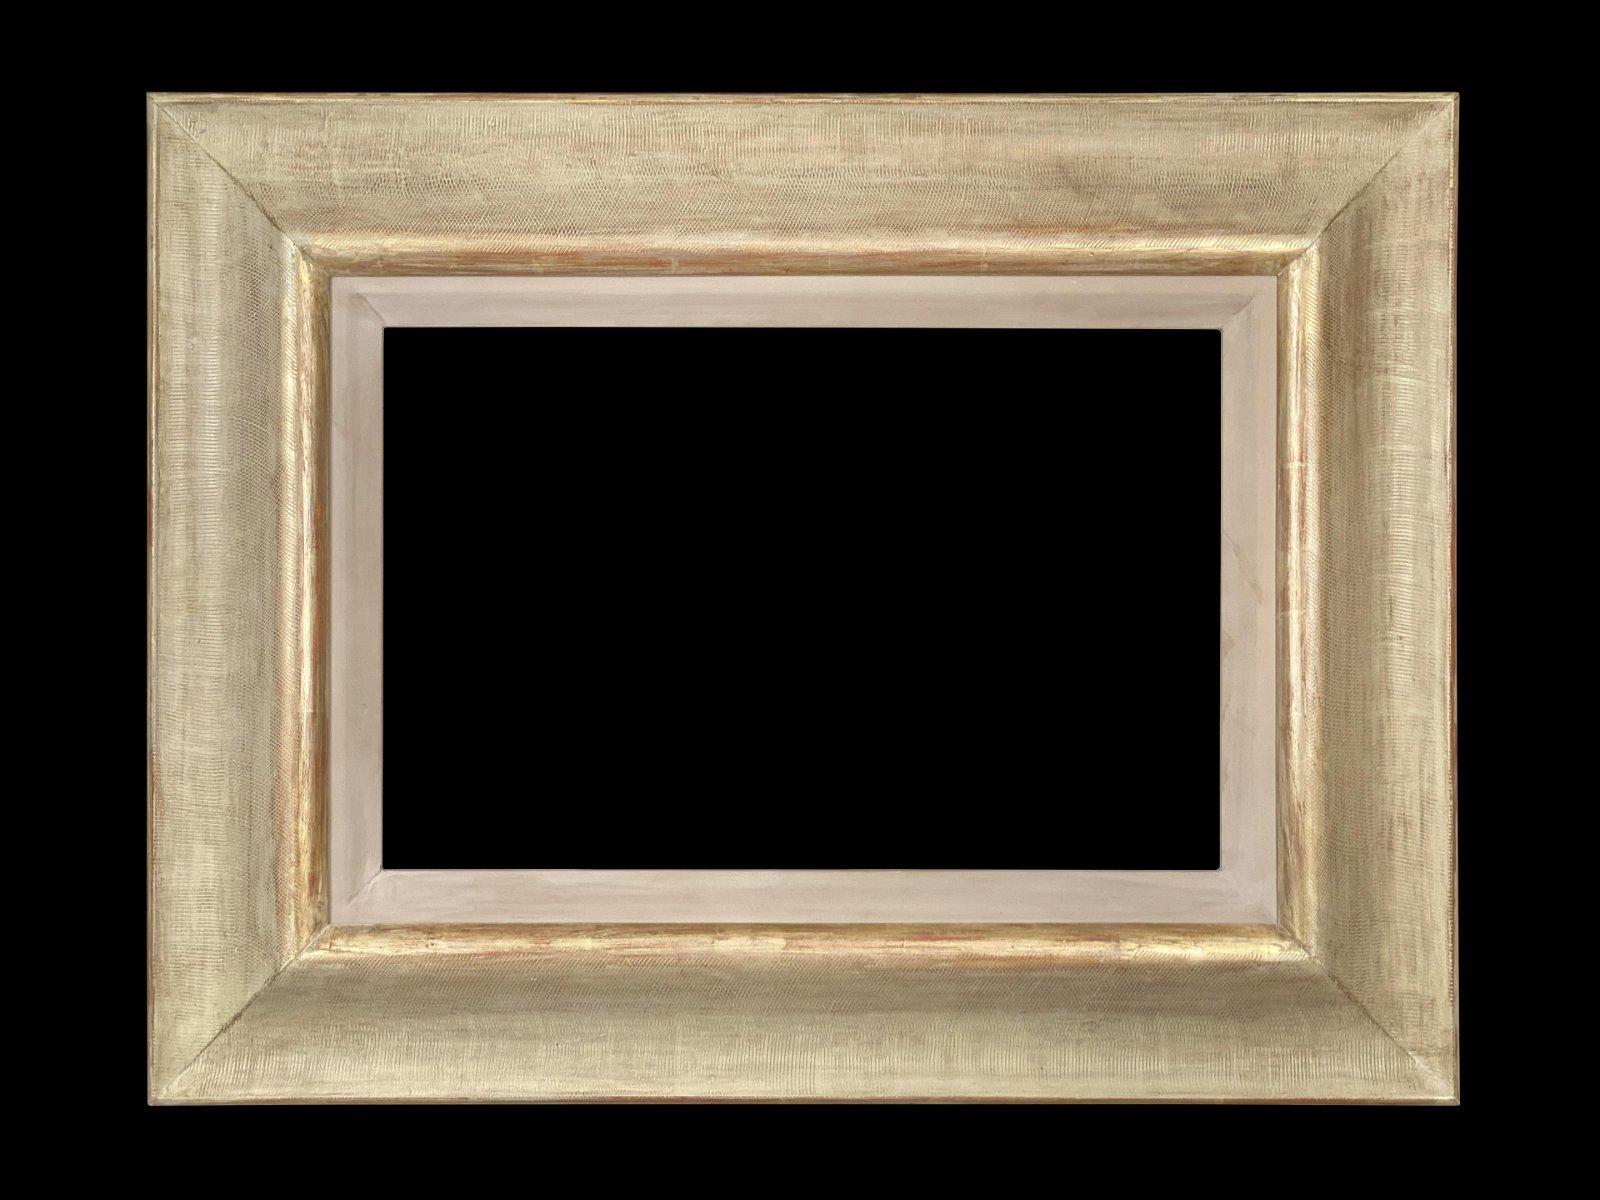 Eli Wilner Frame, Carl Sandelin Design Style Frame